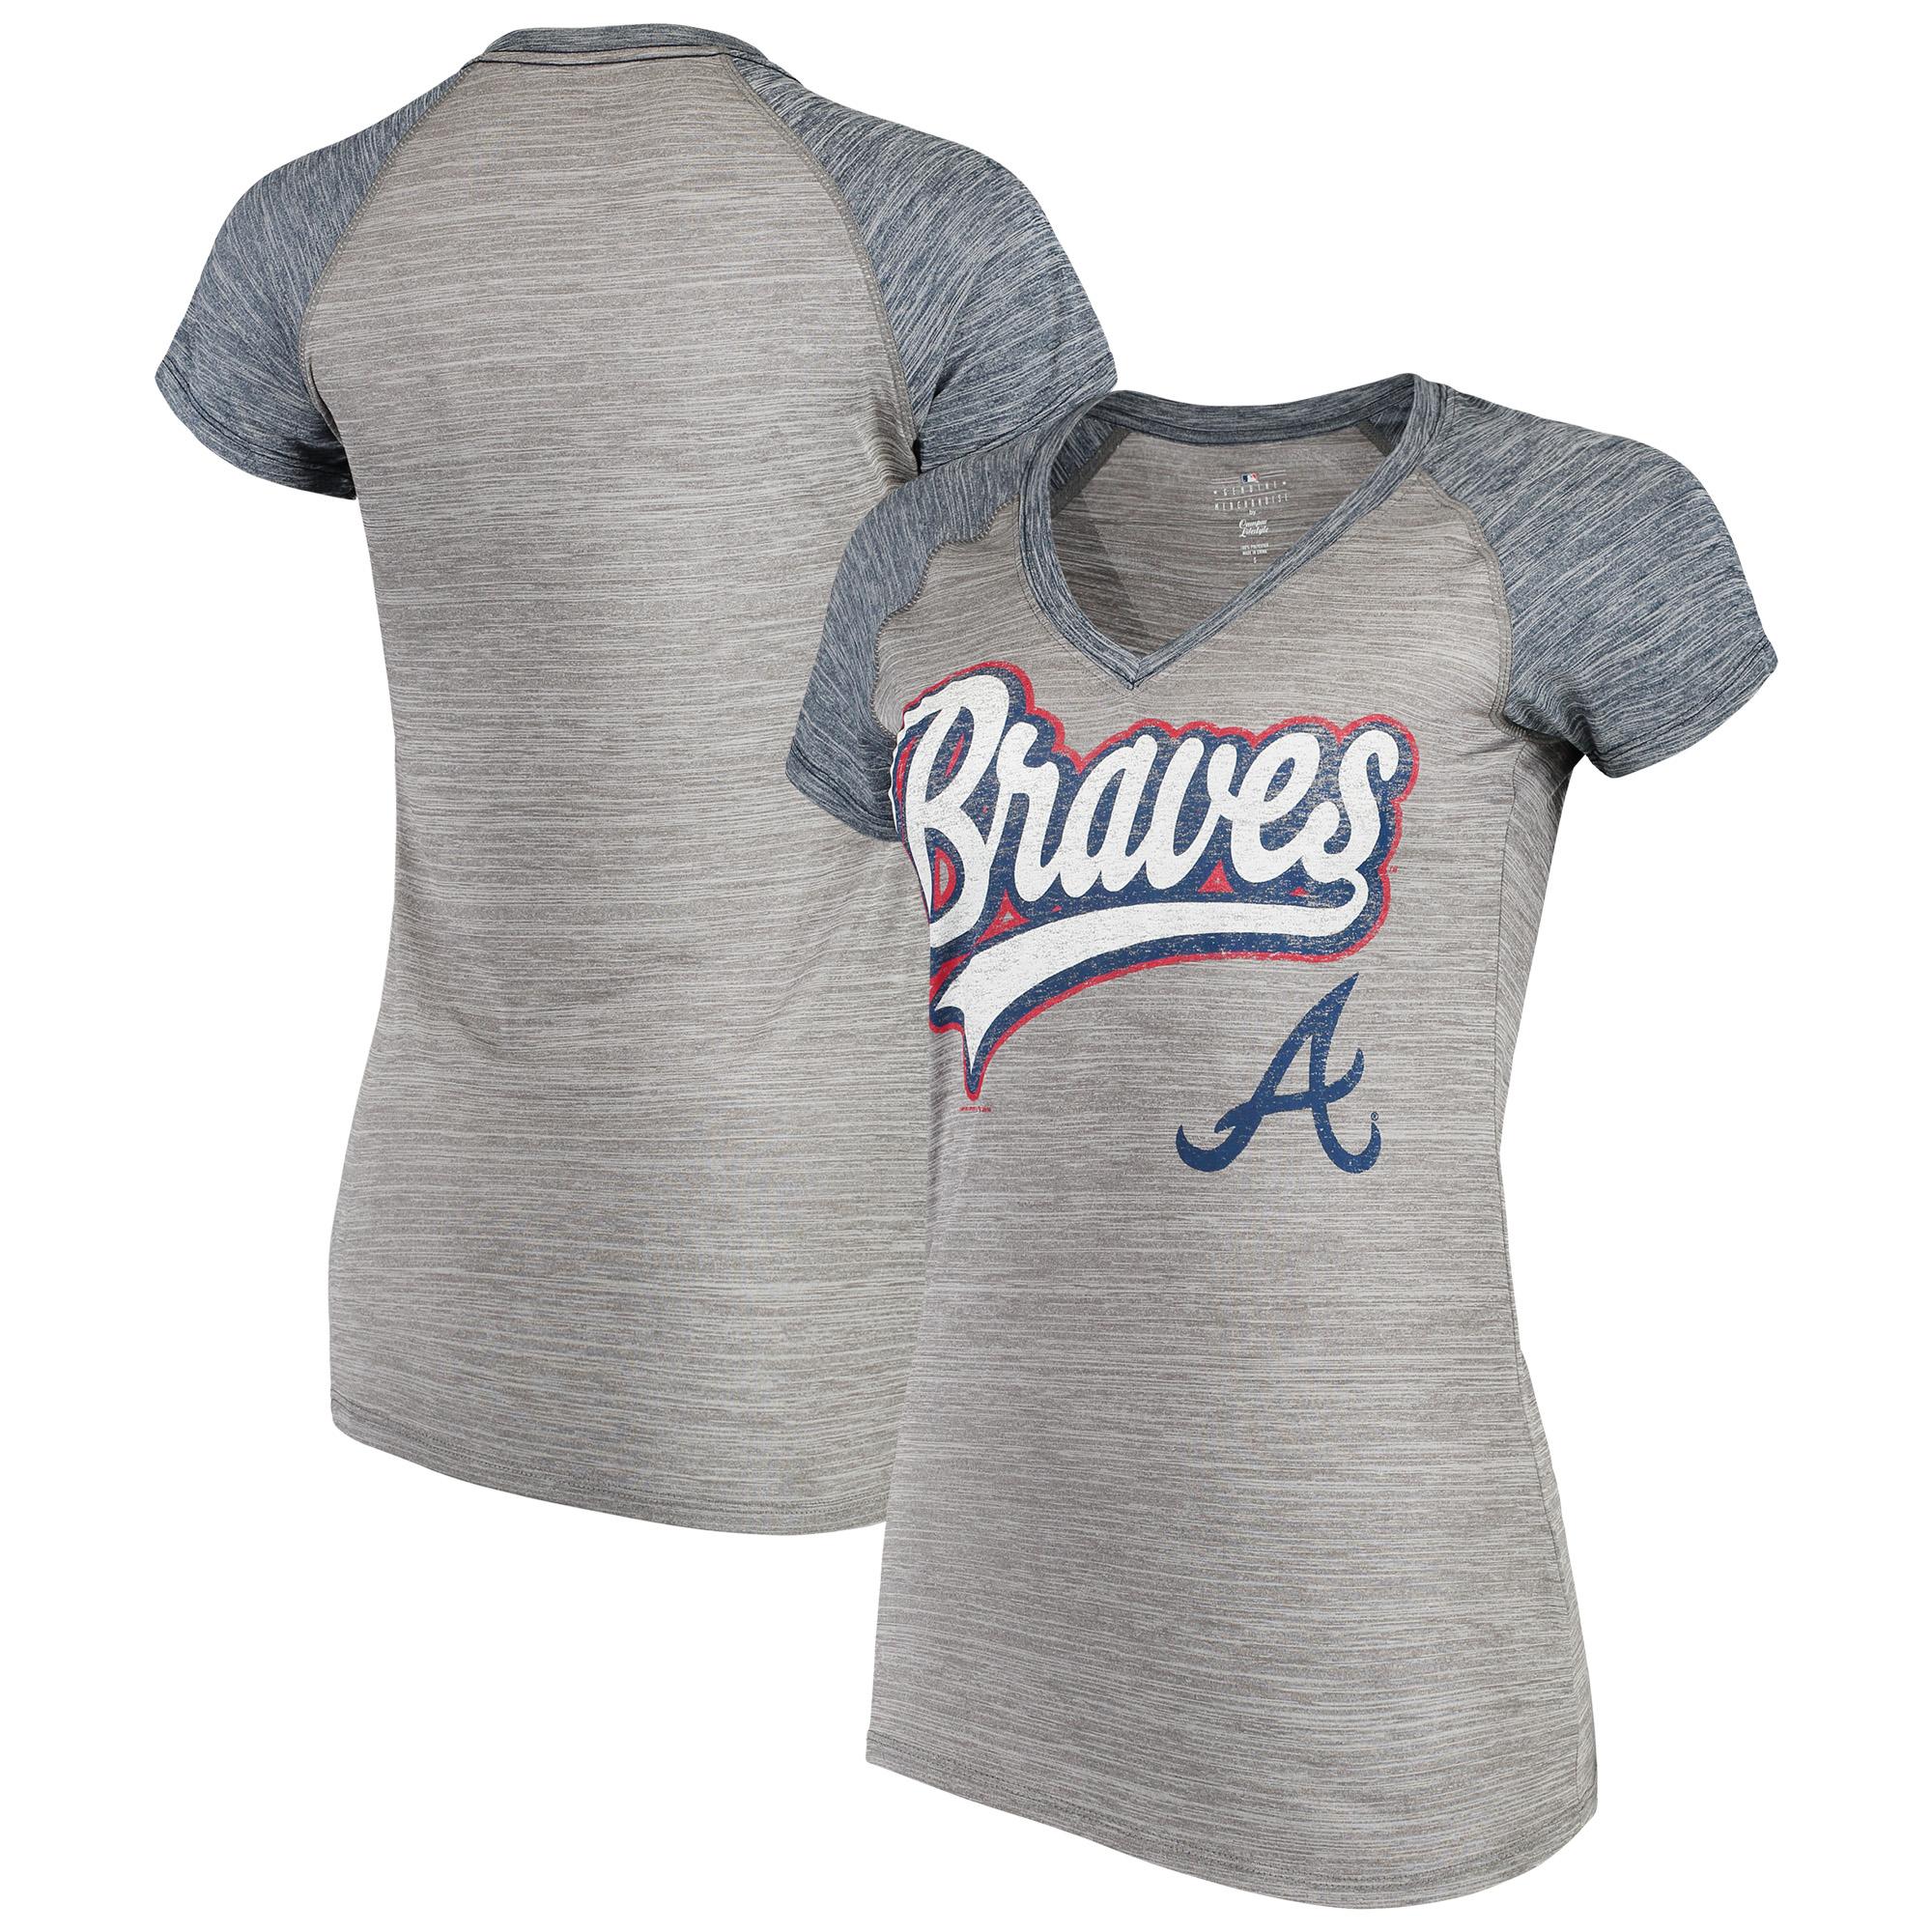 Women's New Era Gray Atlanta Braves Space Dye V-Neck T-Shirt